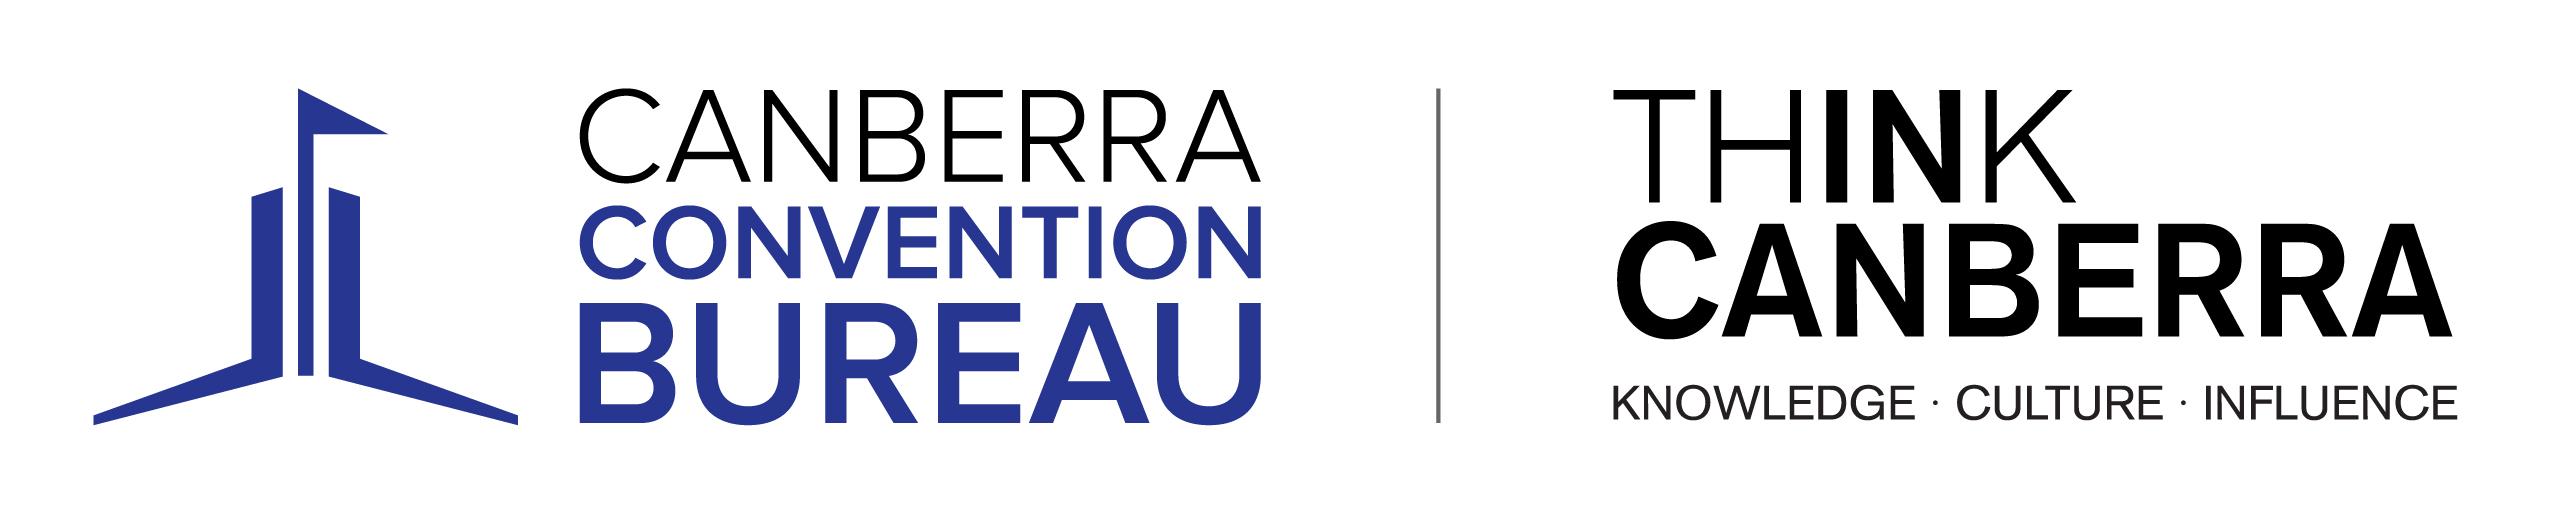 Canberra Convention Bureau